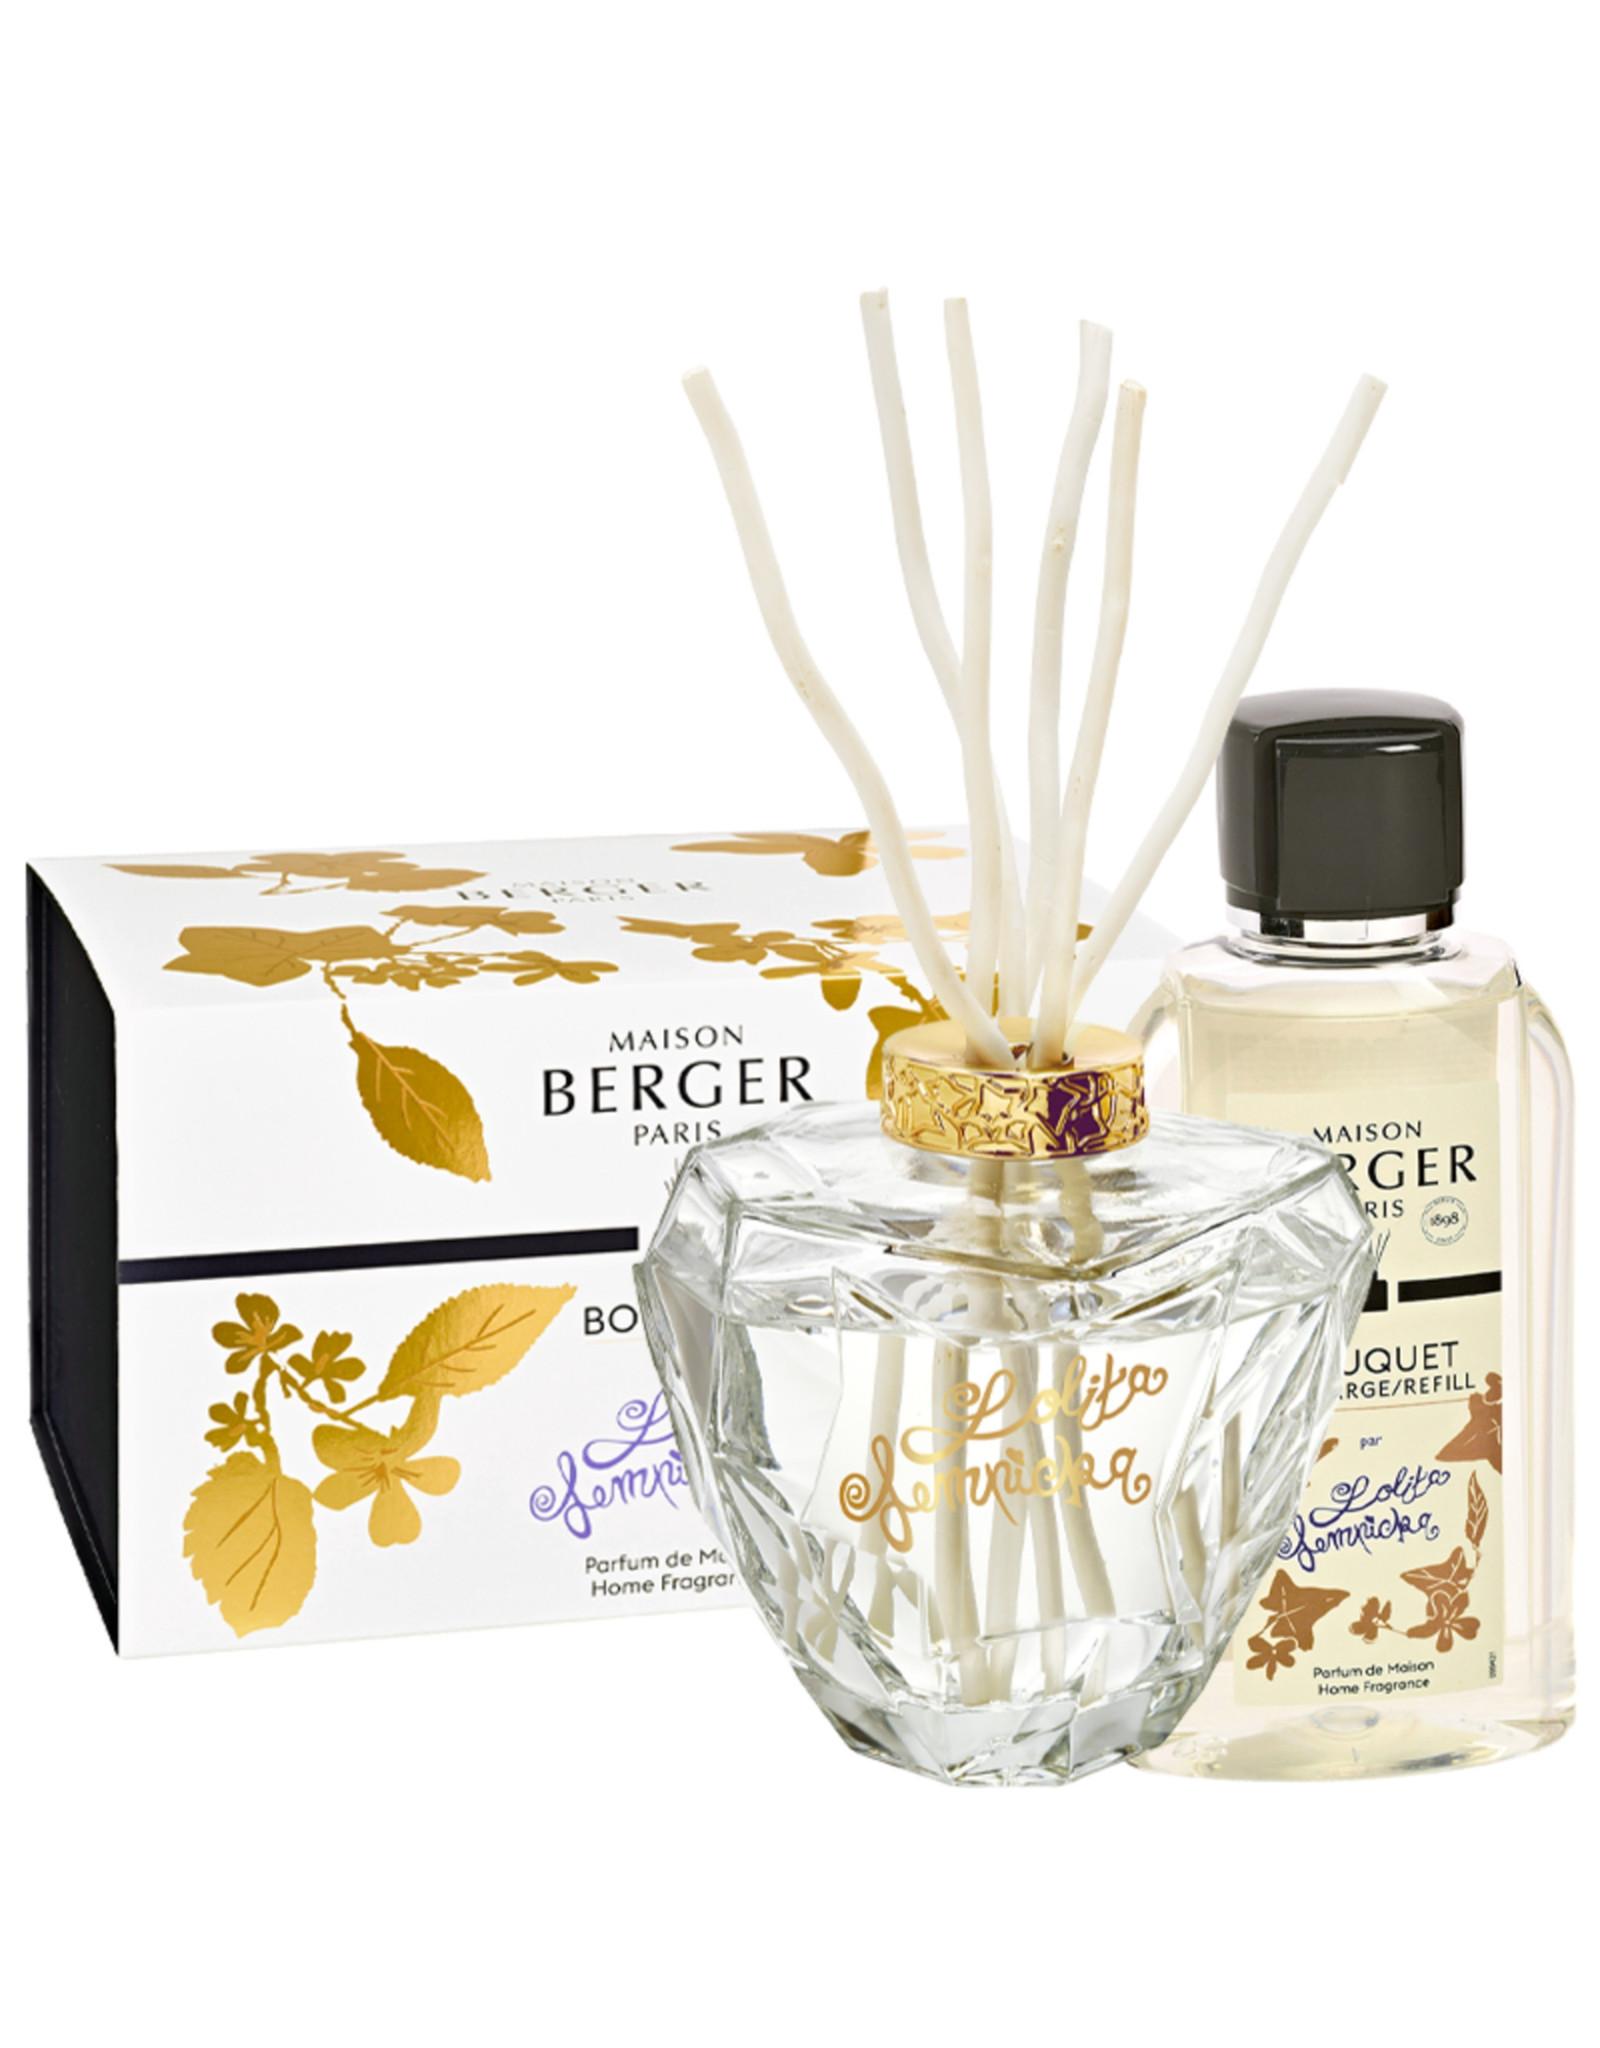 Maison Berger Lolita Lempicka - Premium Geurstokjes